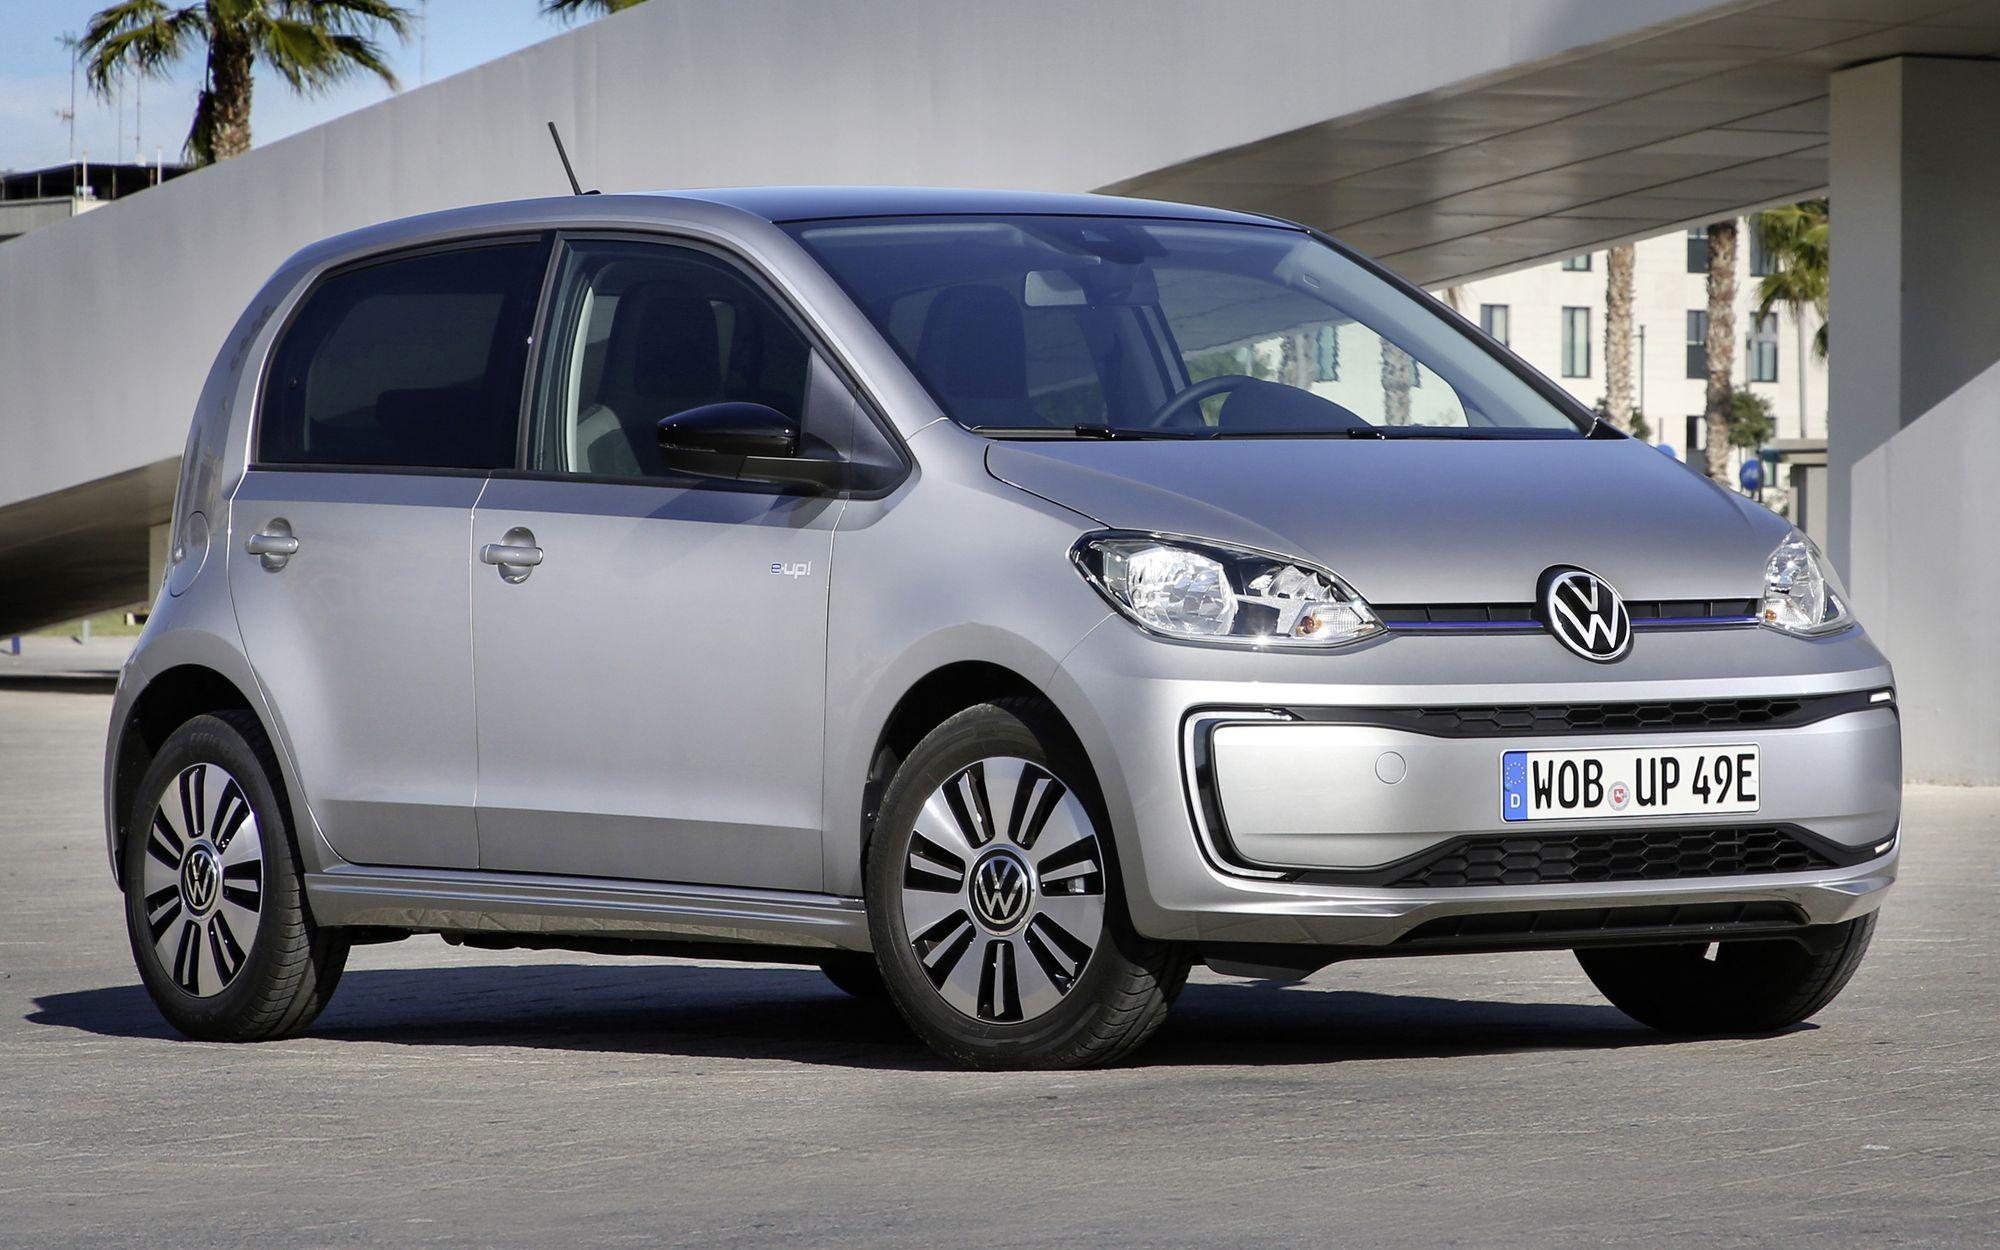 Дешёвый электрокар VW не получит платформу MEB, зато станет кроссовером